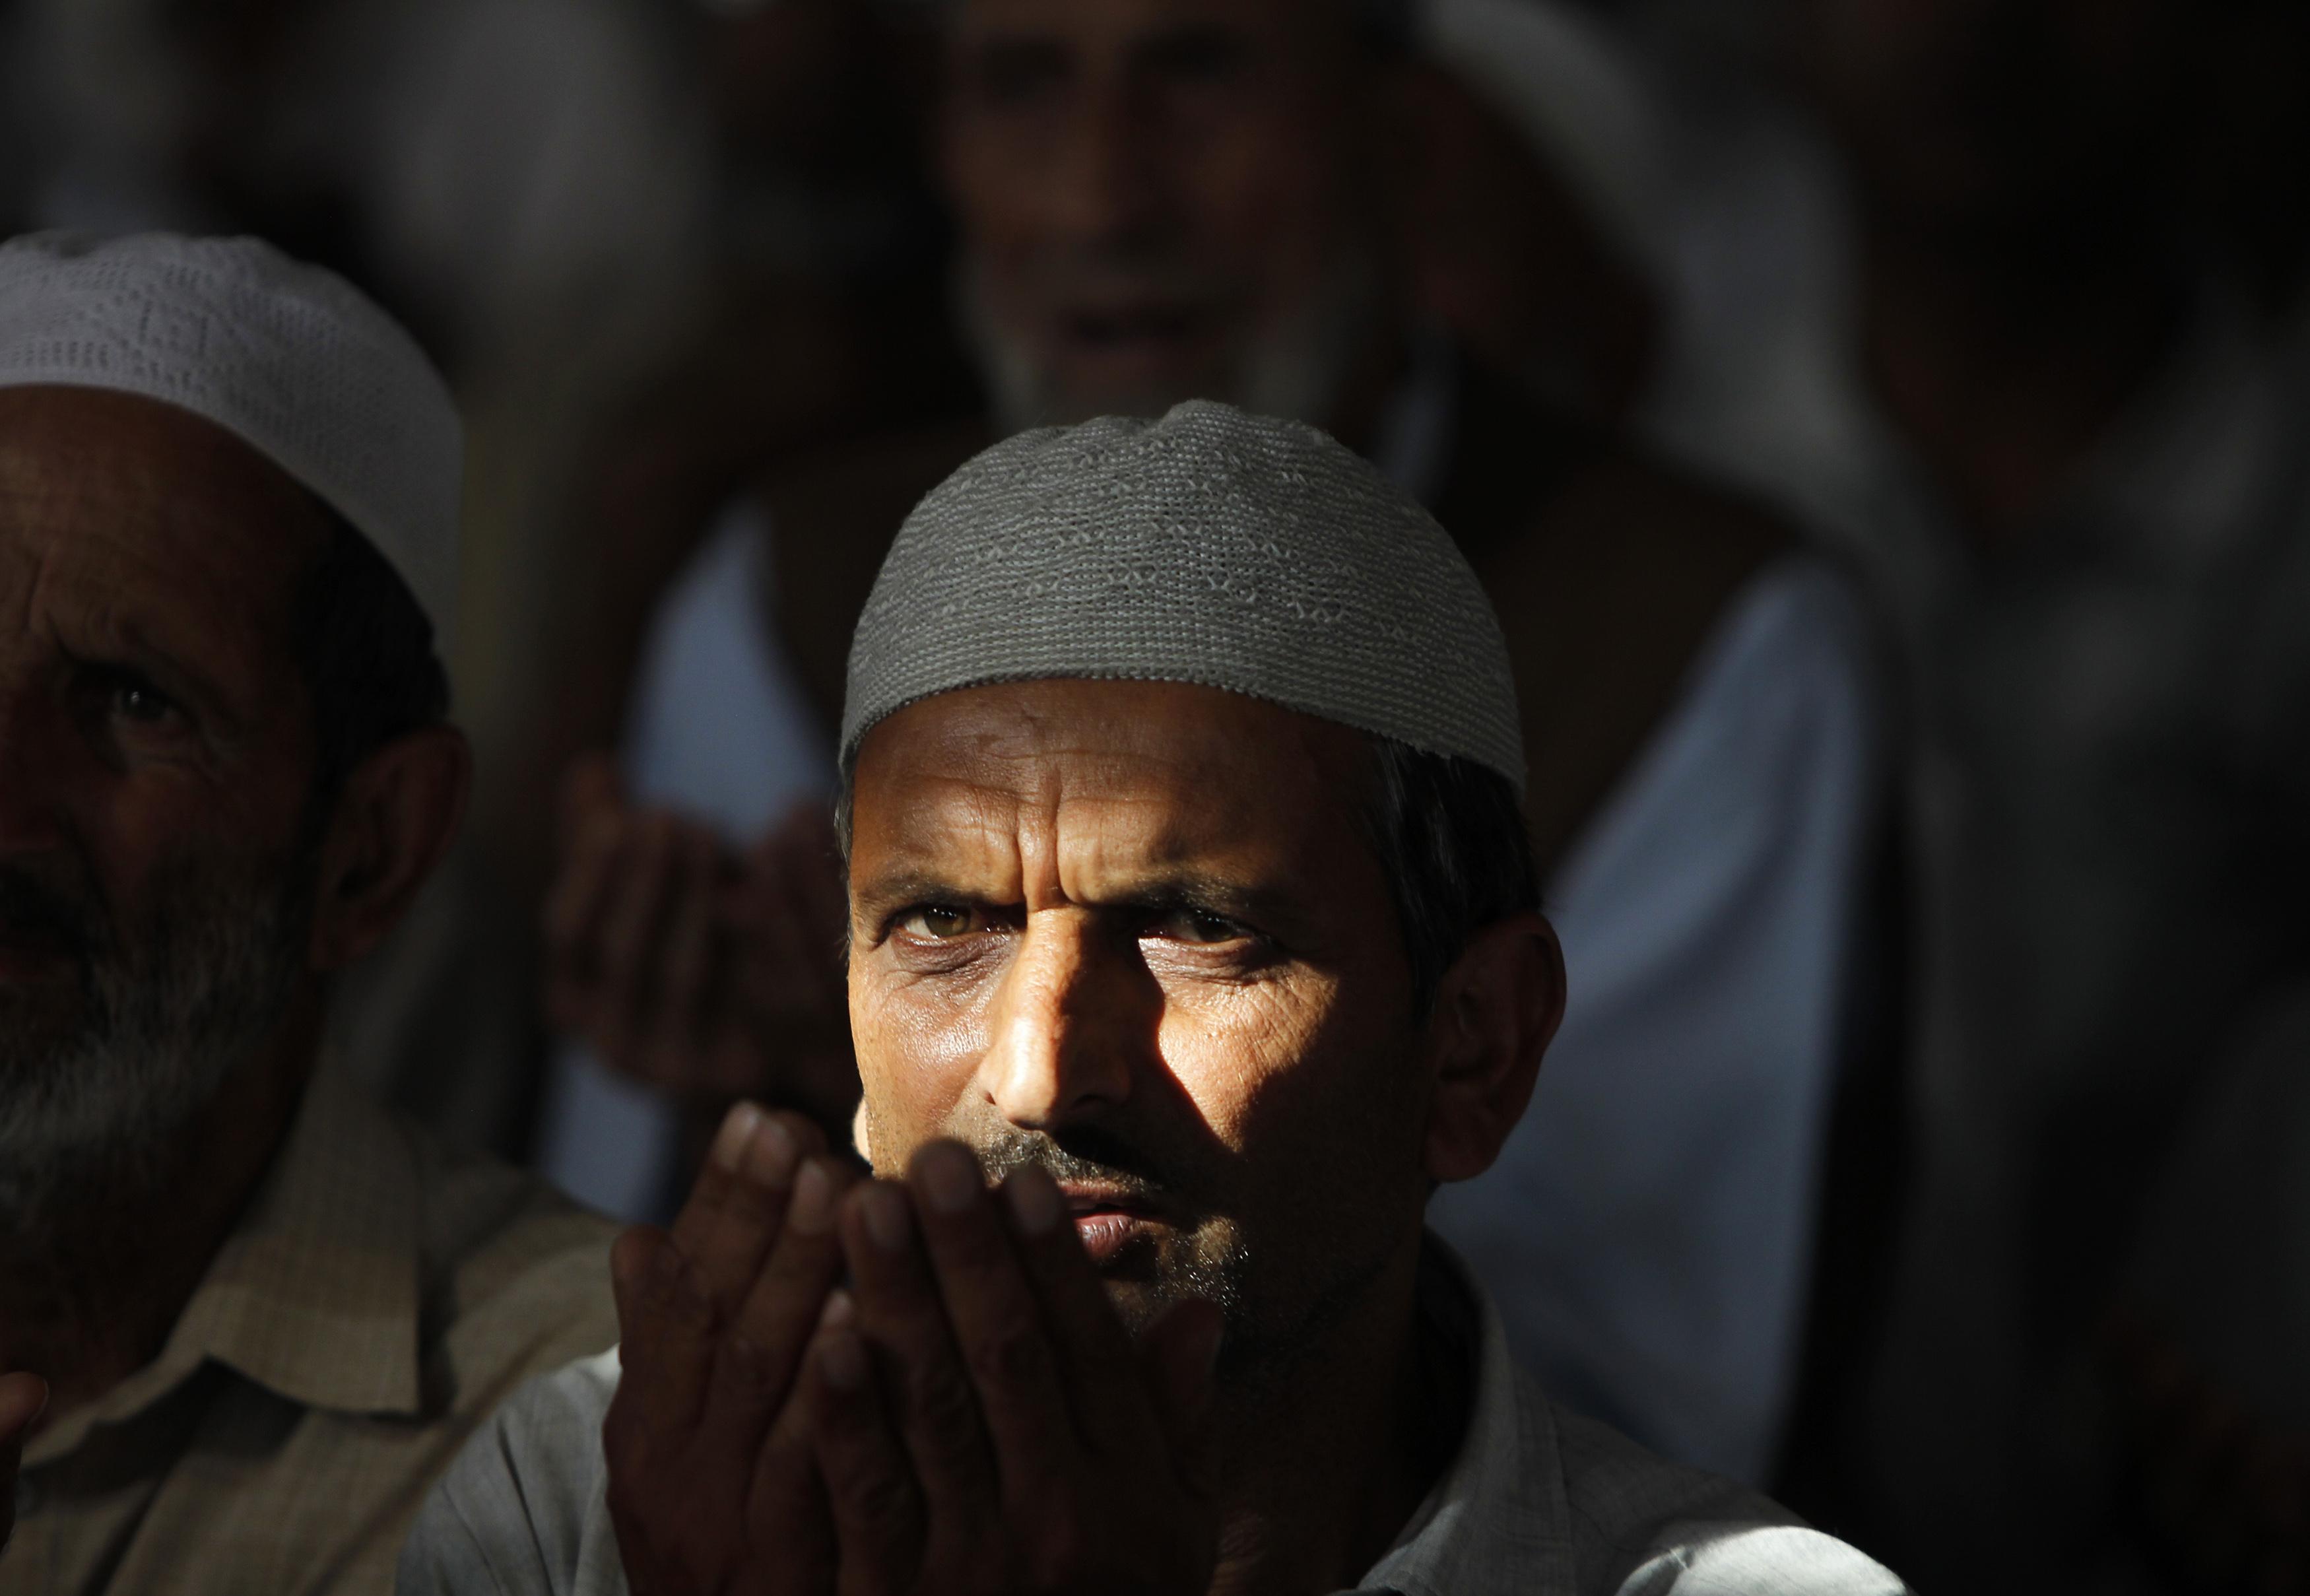 A Kashmiri Muslim man prays inside the shrine of Sheikh Abdul Qadir Jeelani, a Sufi saint, during the holy month of Ramadan in Srinagar, Kashmir on  July 9, 2014.